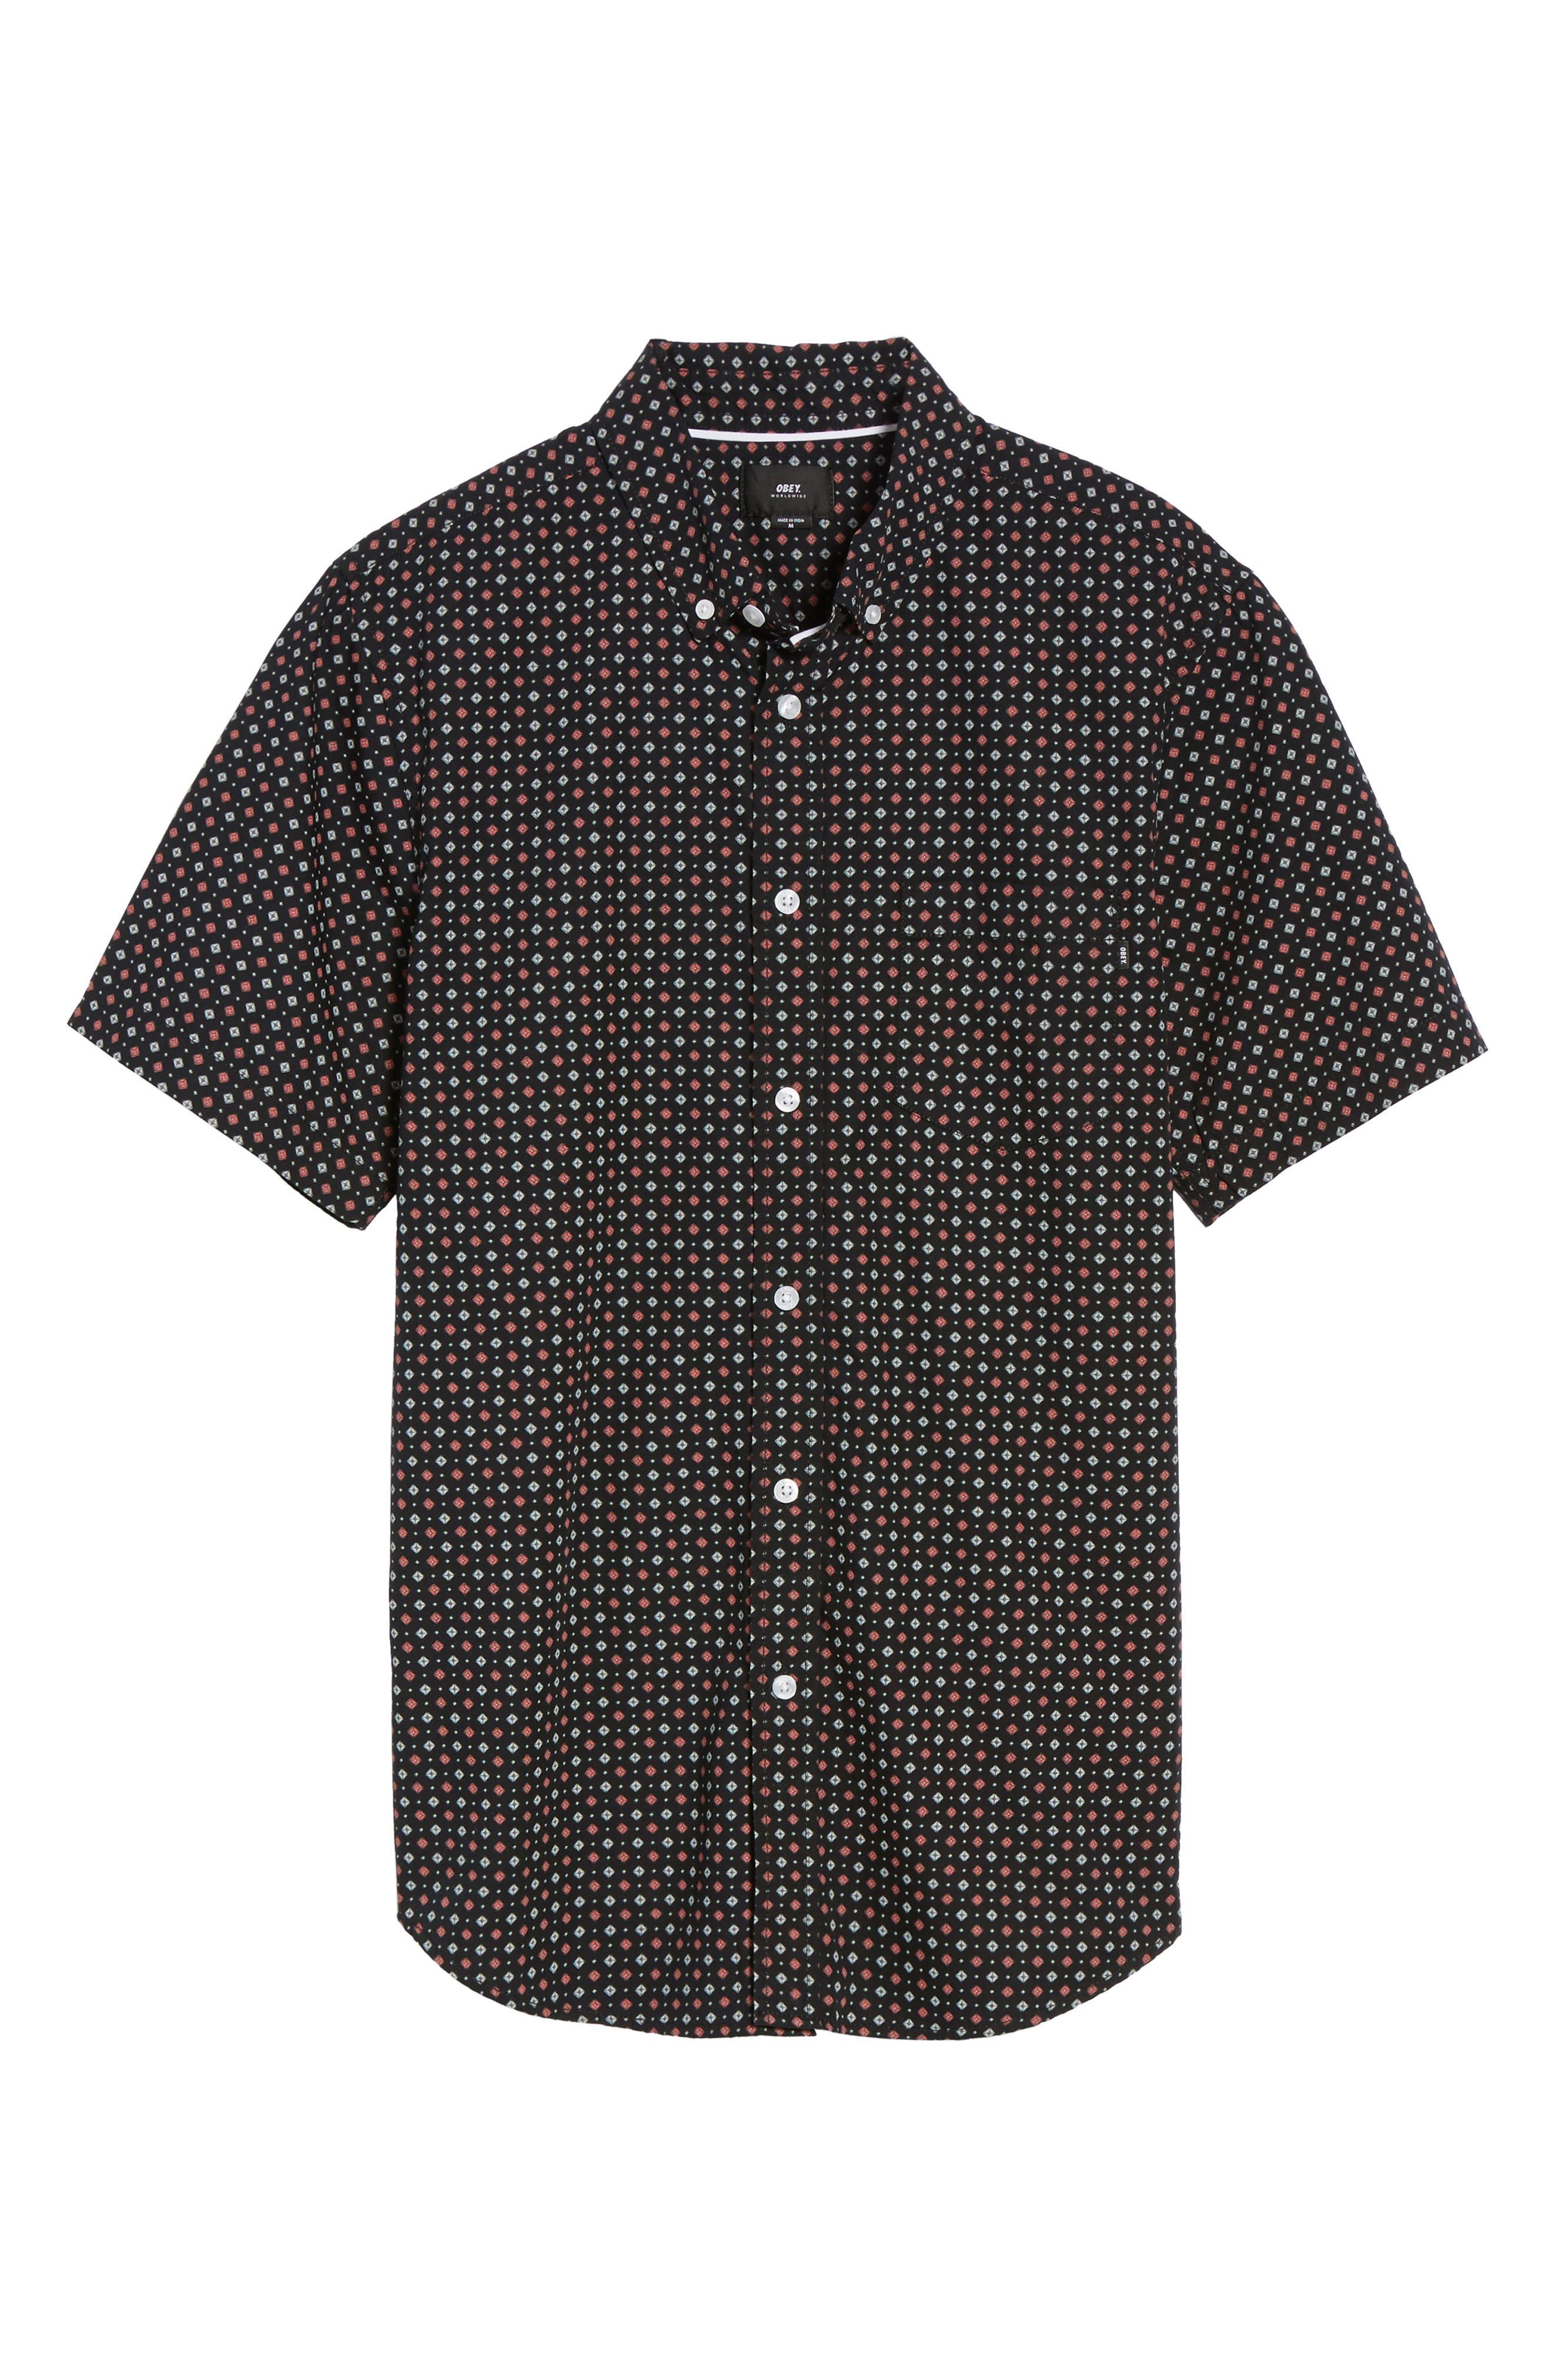 Sterling Woven Shirt,                             Alternate thumbnail 11, color,